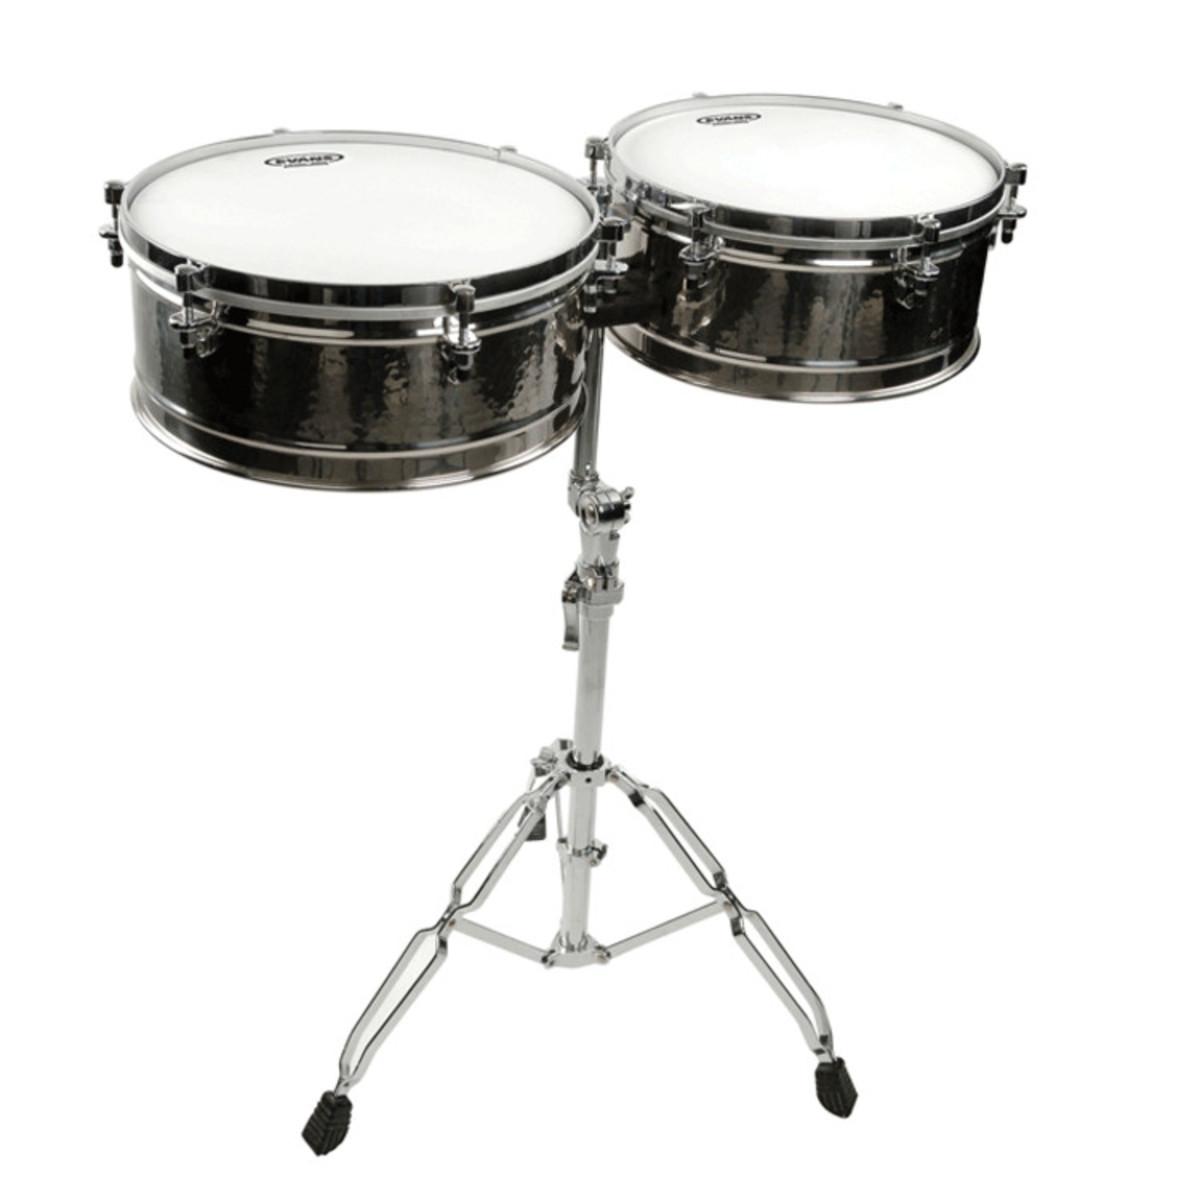 disc evans j1 etched drum head 16 inch at gear4music. Black Bedroom Furniture Sets. Home Design Ideas